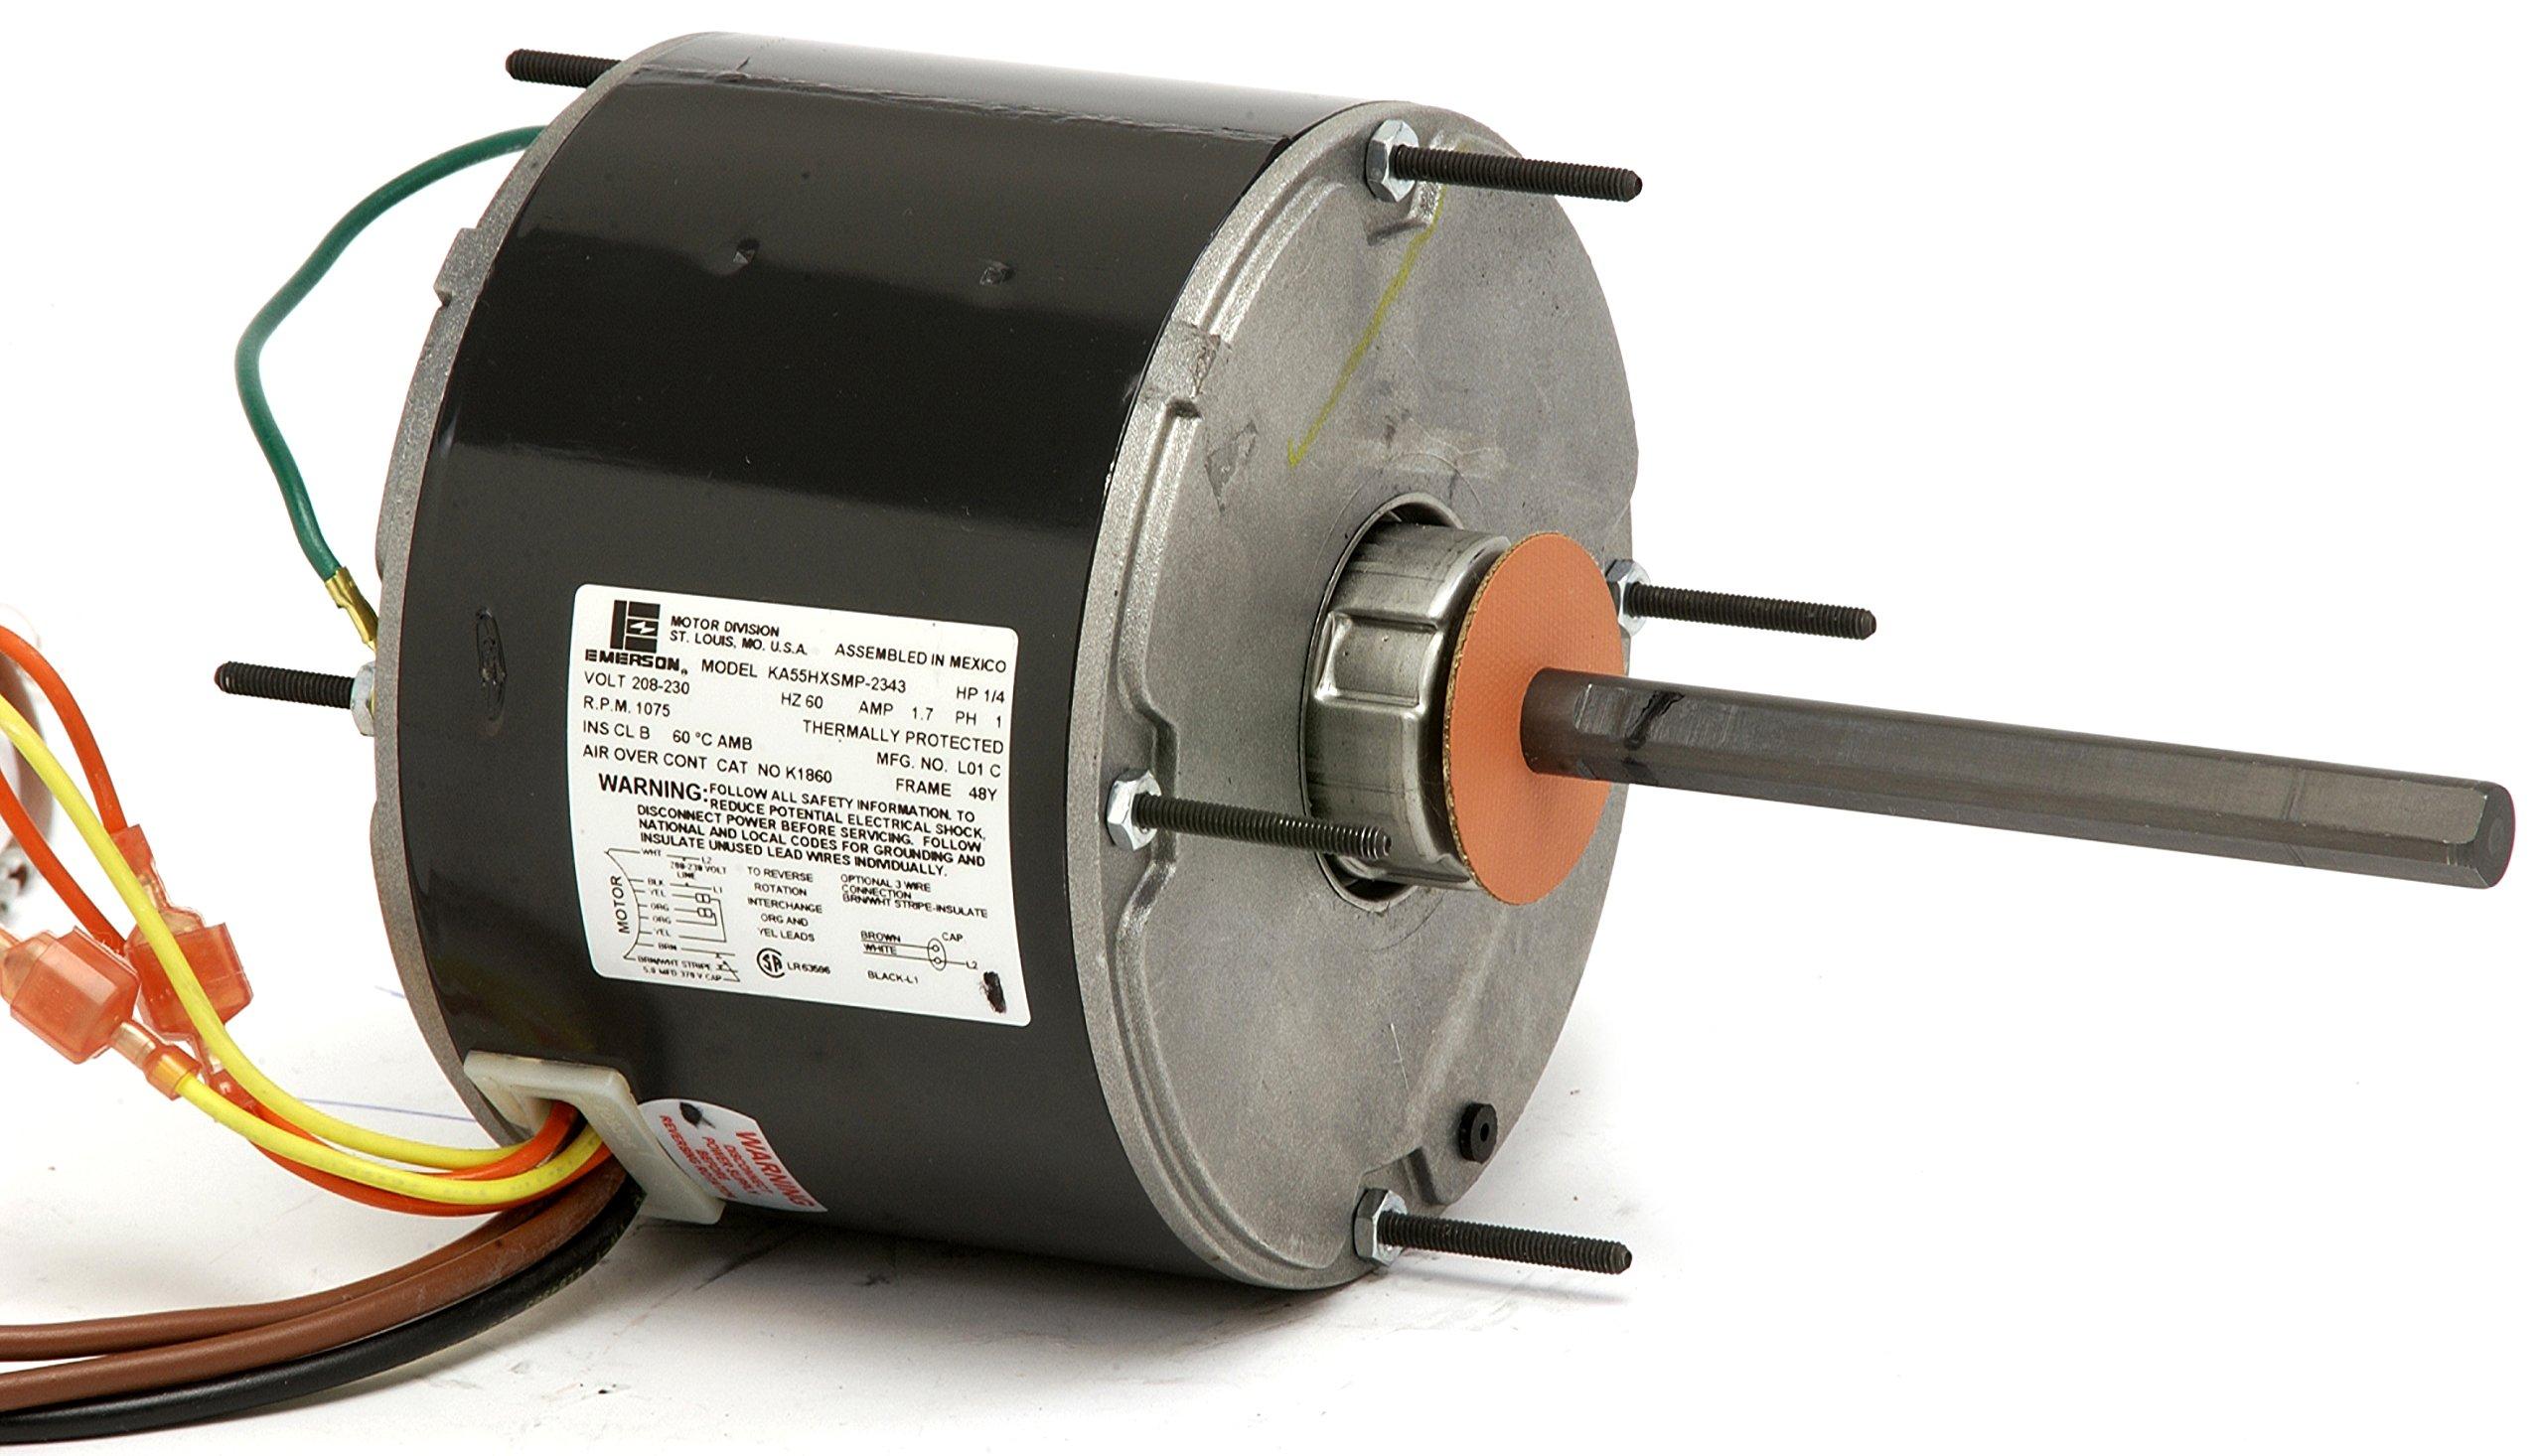 NIDEC MOTOR CORPORATION (Emerson / US Motors) 1873 1/6 HP Condenser Fan, 5.6'' Diameter, 825 RPM, 208-230 Volts